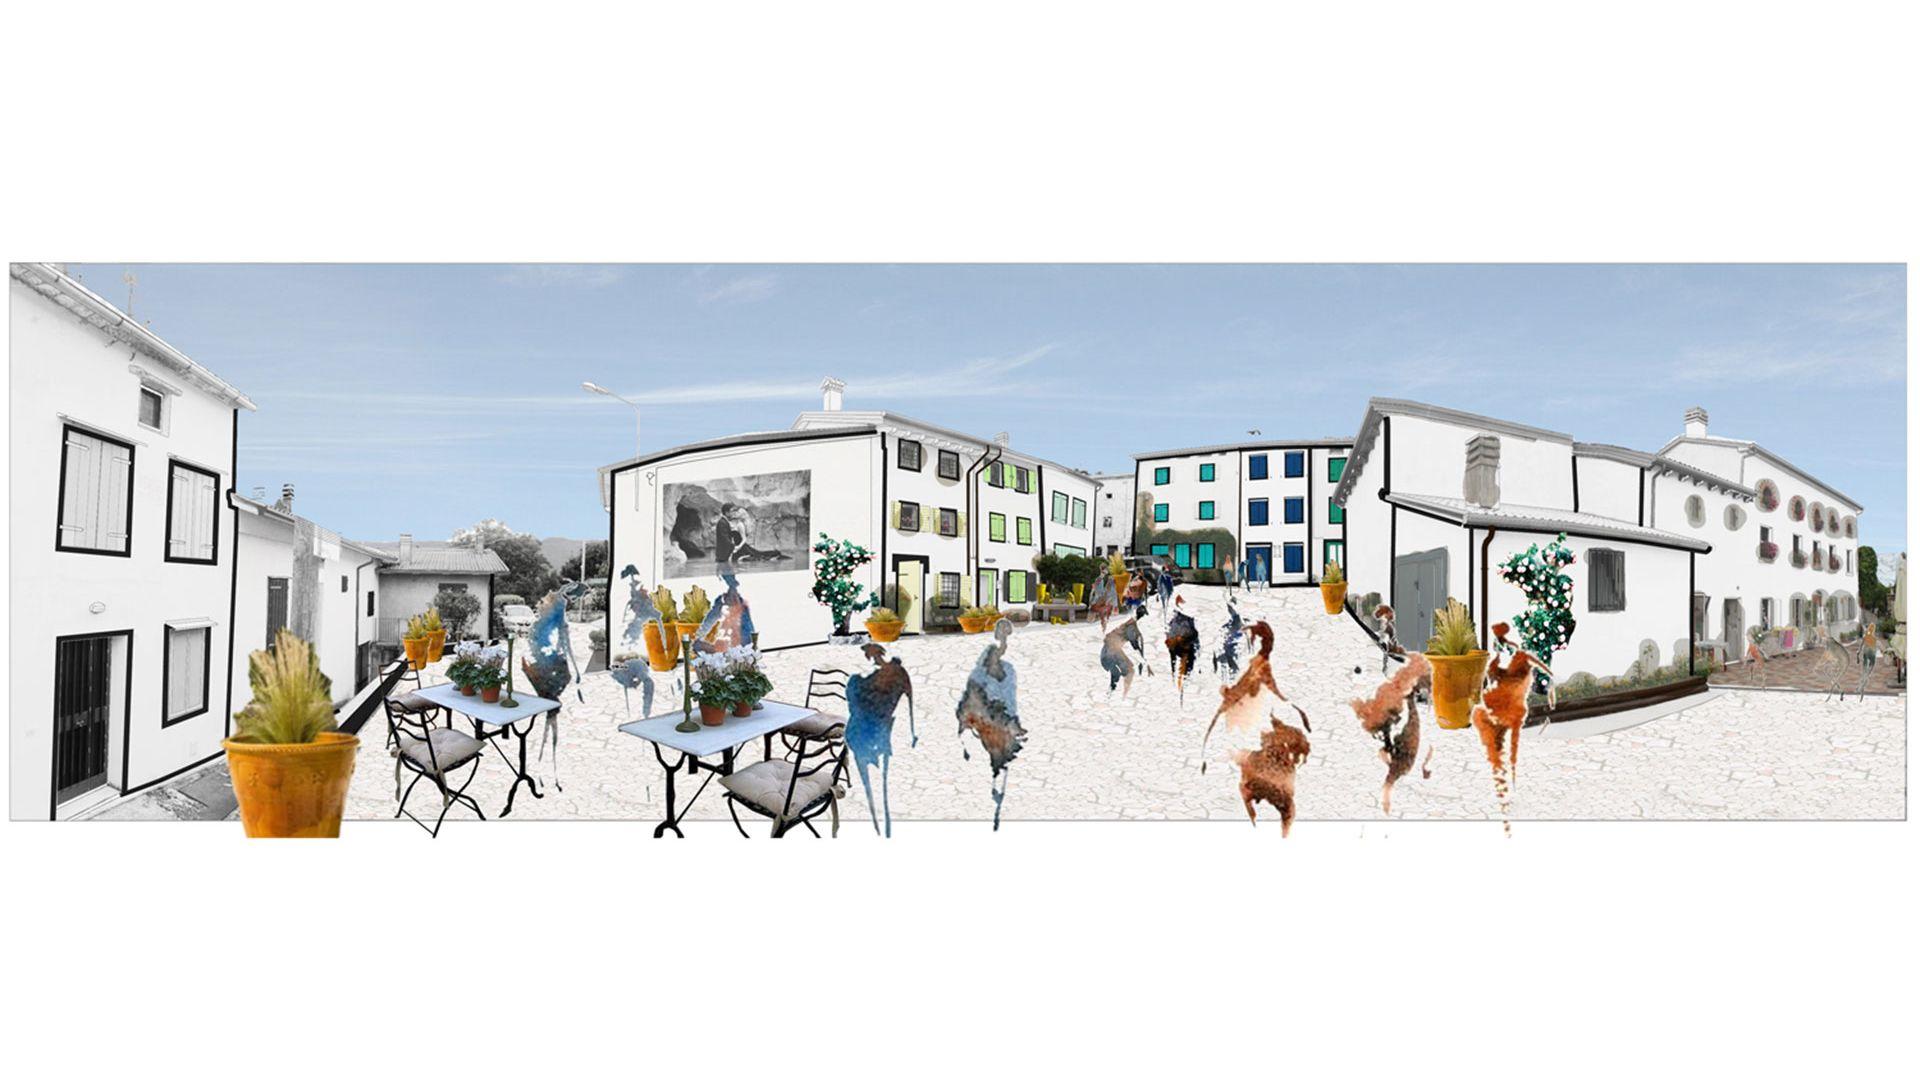 Contrà Alto Plaza Design Proposal